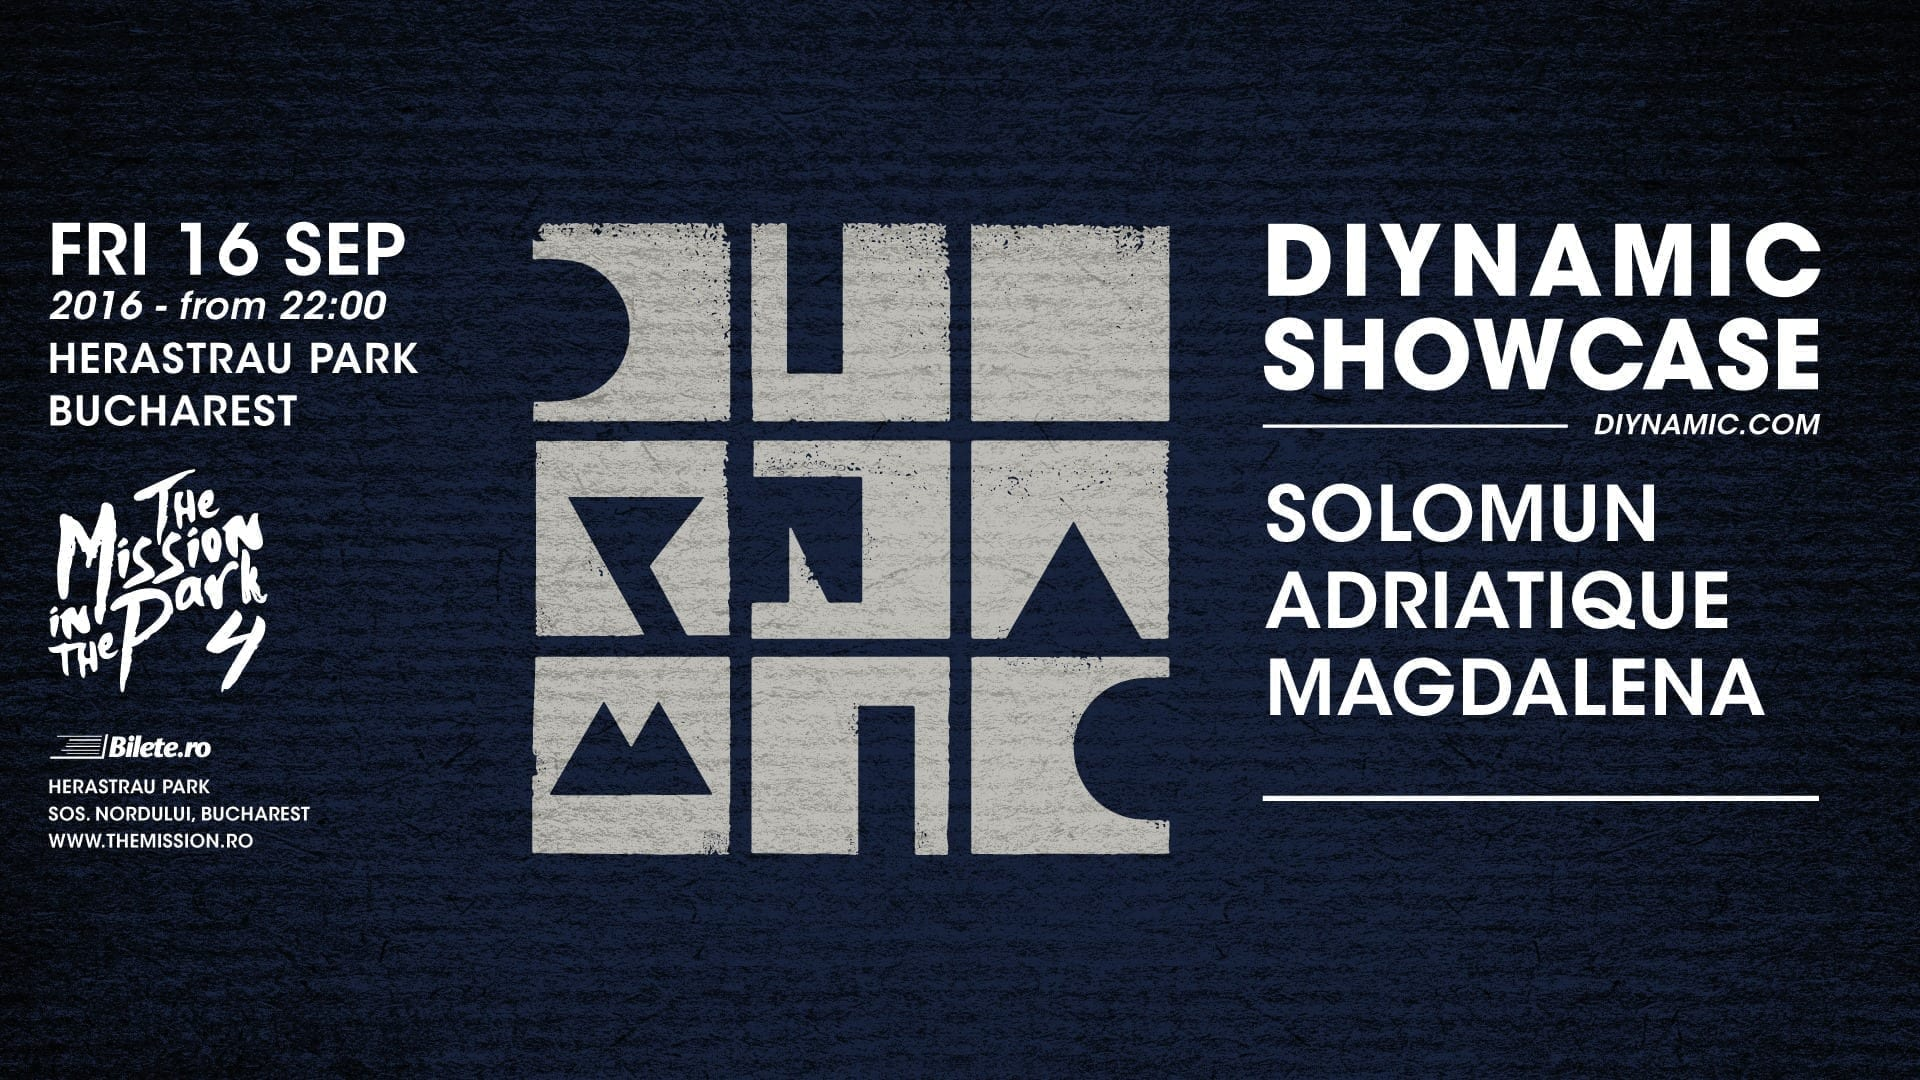 Diynamic Showcase pres. The Mission in the Park w/ Solomun, Adriatique, Magdalena @ Herăstrău Park